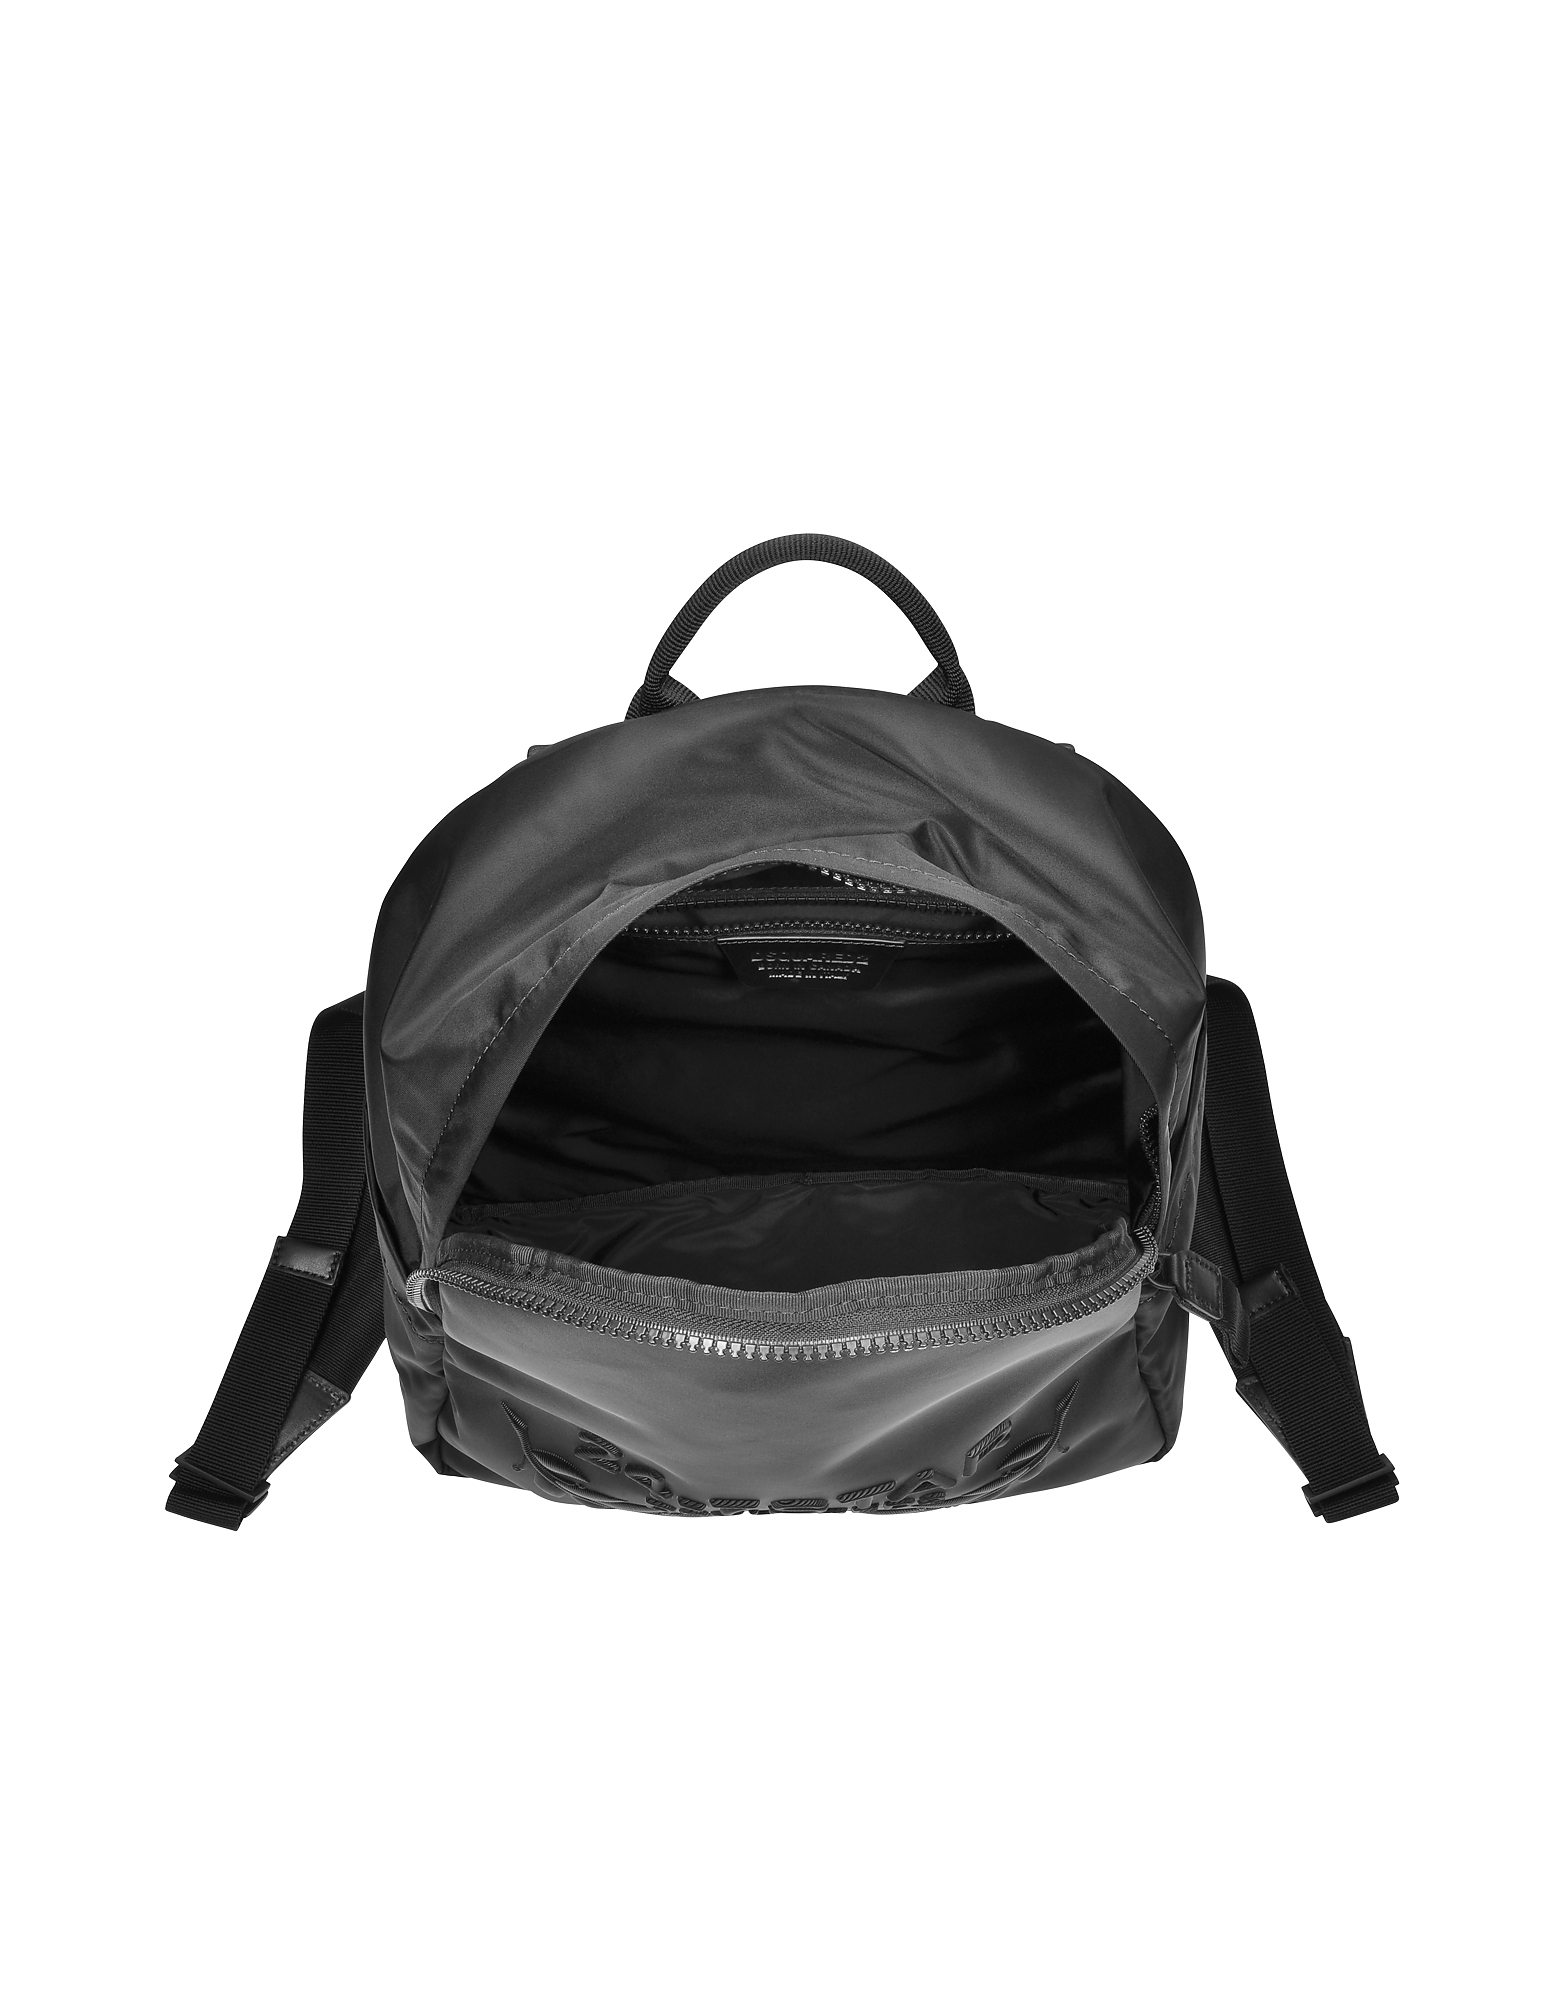 24-7 Star Icon Black Nylon Backpack от Forzieri.com INT